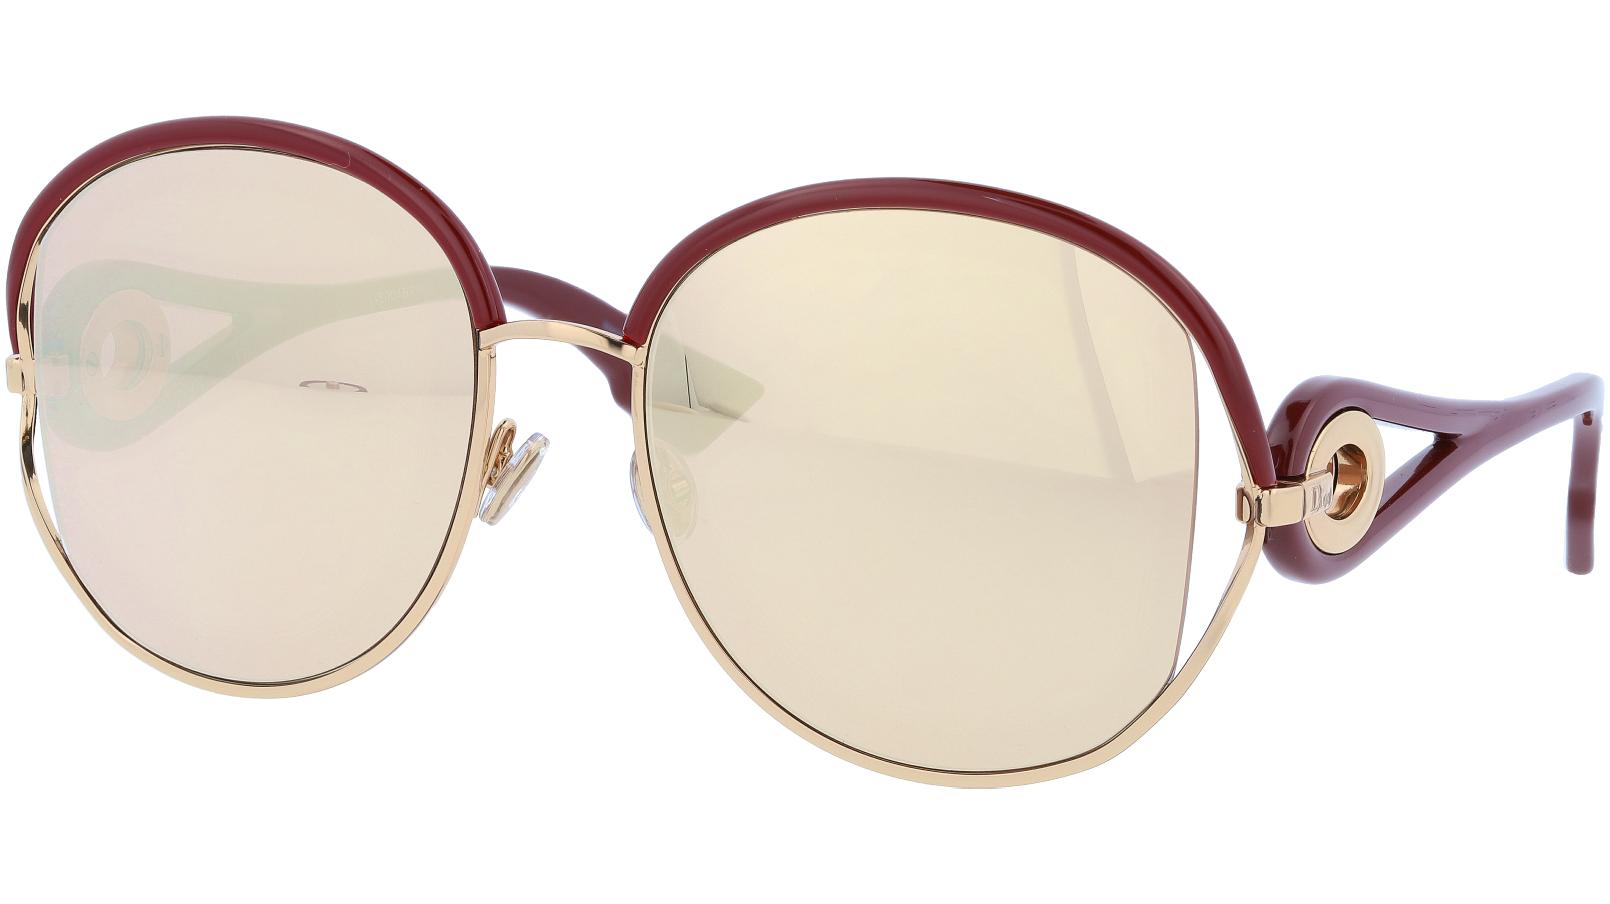 Dior NEWVOLUTE RHLA9 57 Gold Sunglasses